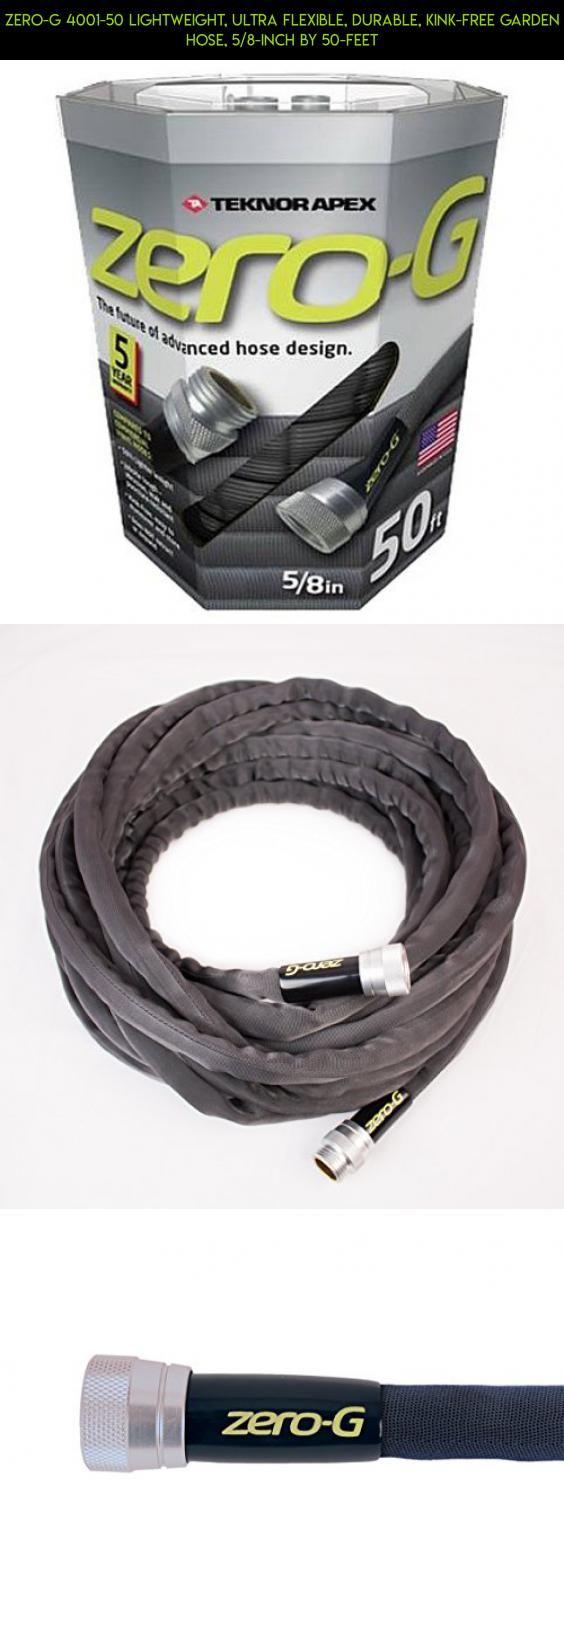 zero g 4001 50 lightweight ultra flexible durable kink free